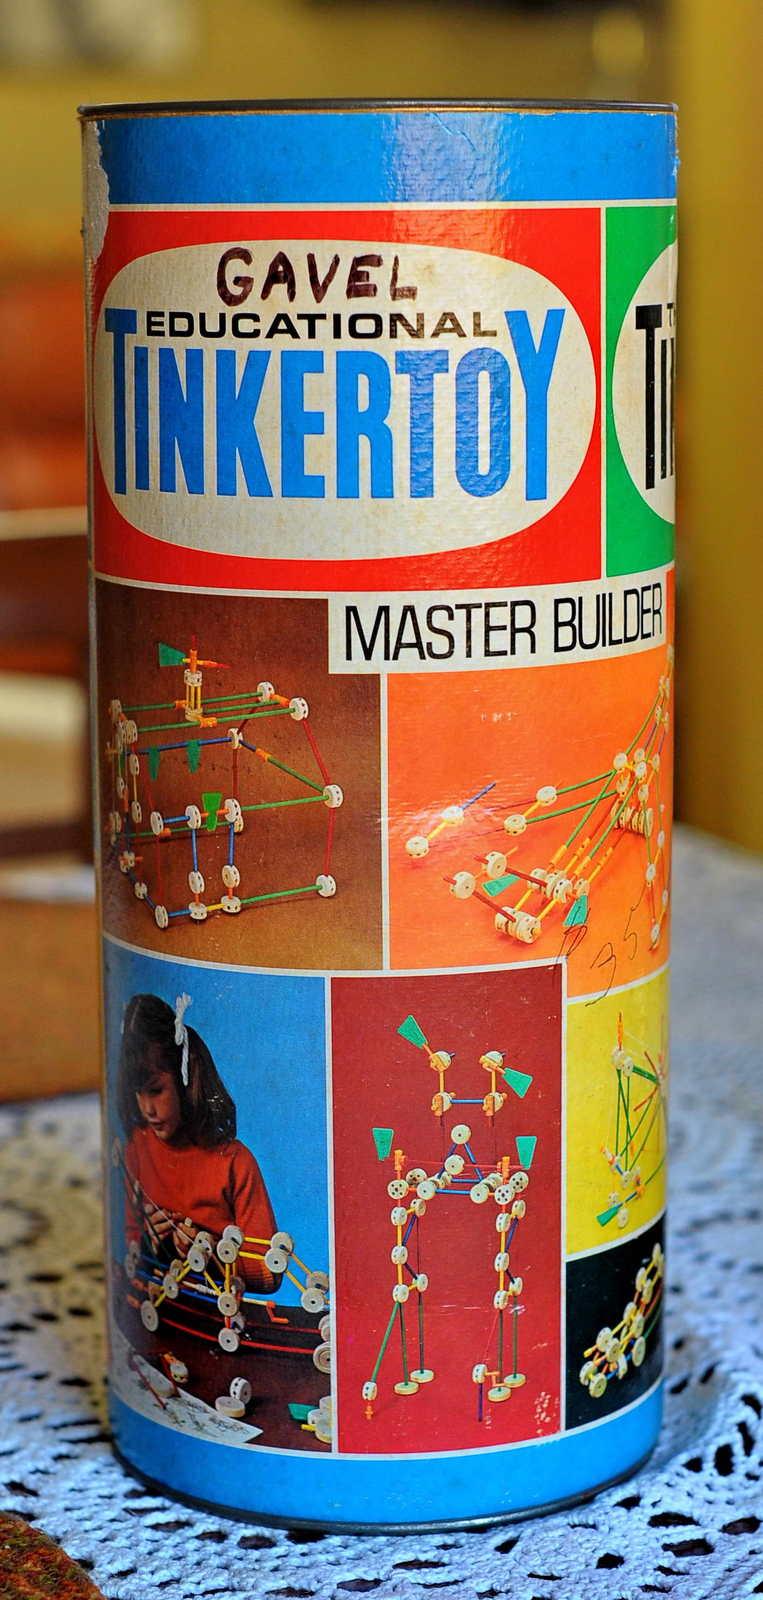 Tinkertoy master builder no. 150.sf